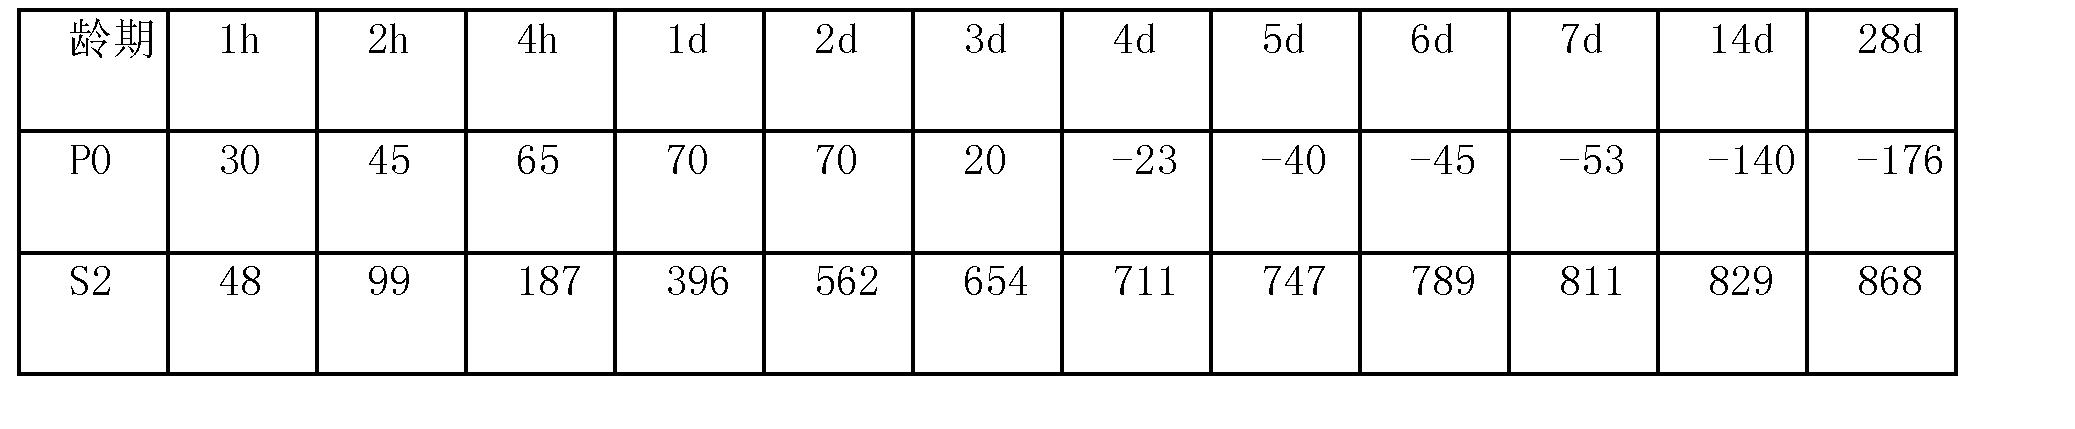 (a)未掺sap混凝土的微结构(多条微裂缝)